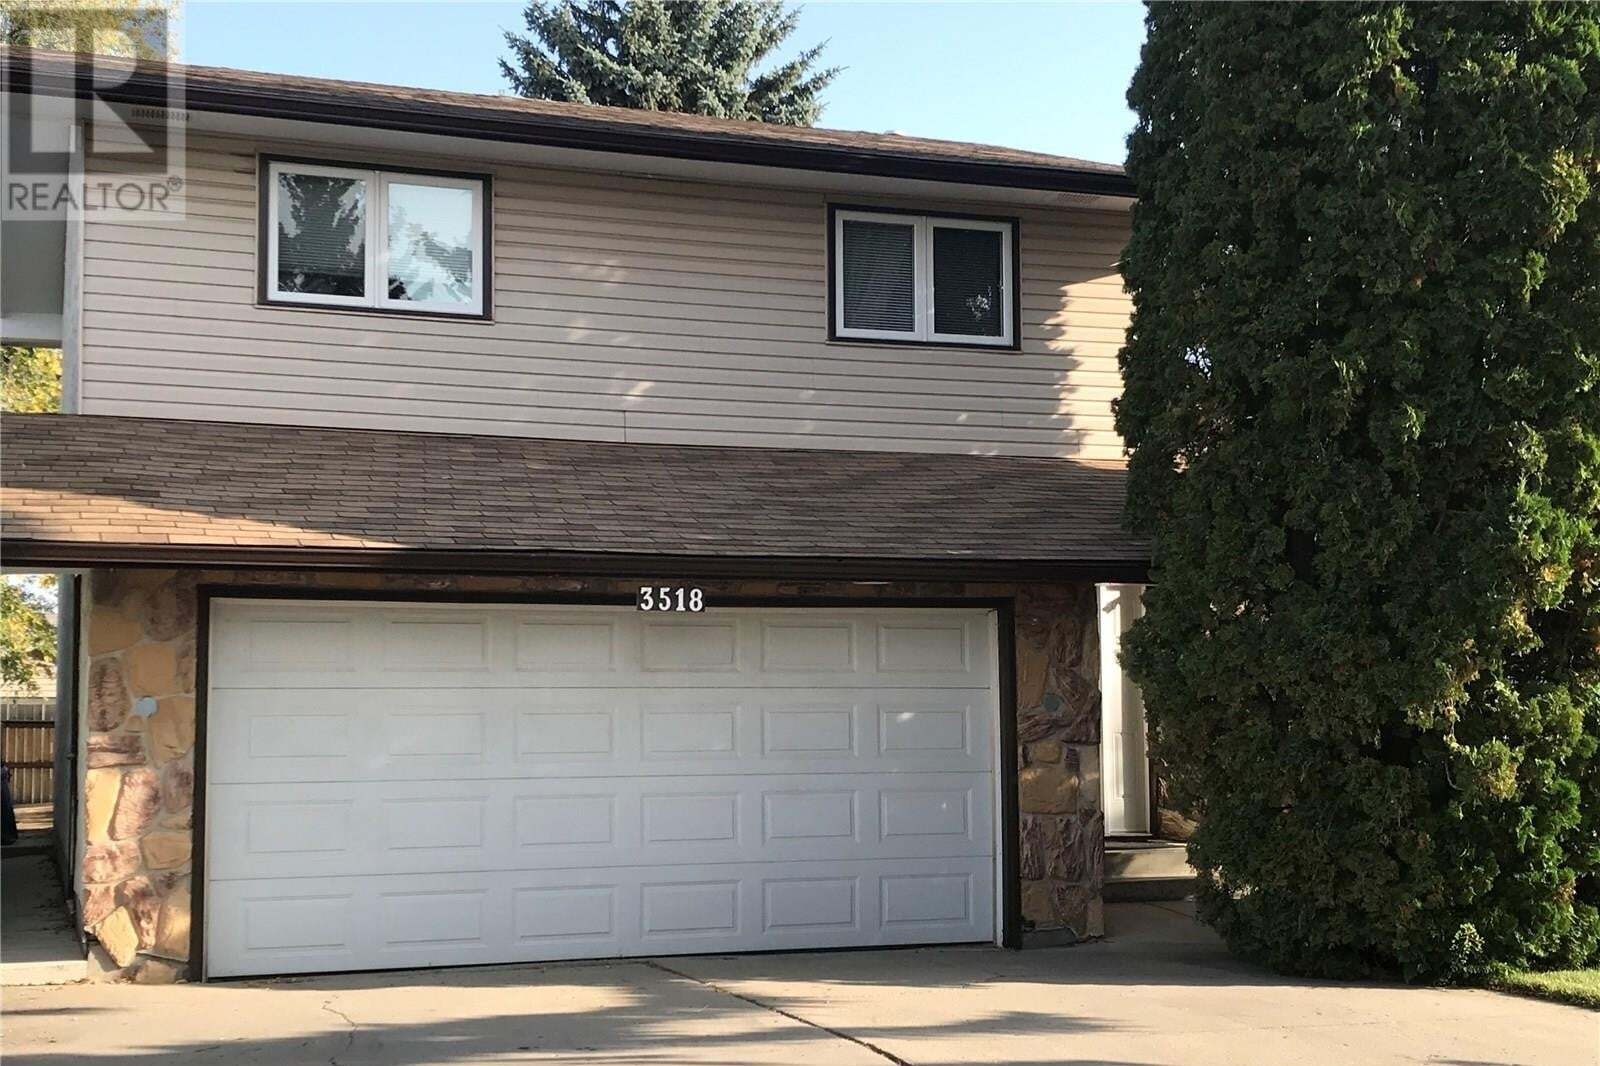 House for sale at 3518 Centennial Dr Saskatoon Saskatchewan - MLS: SK827017